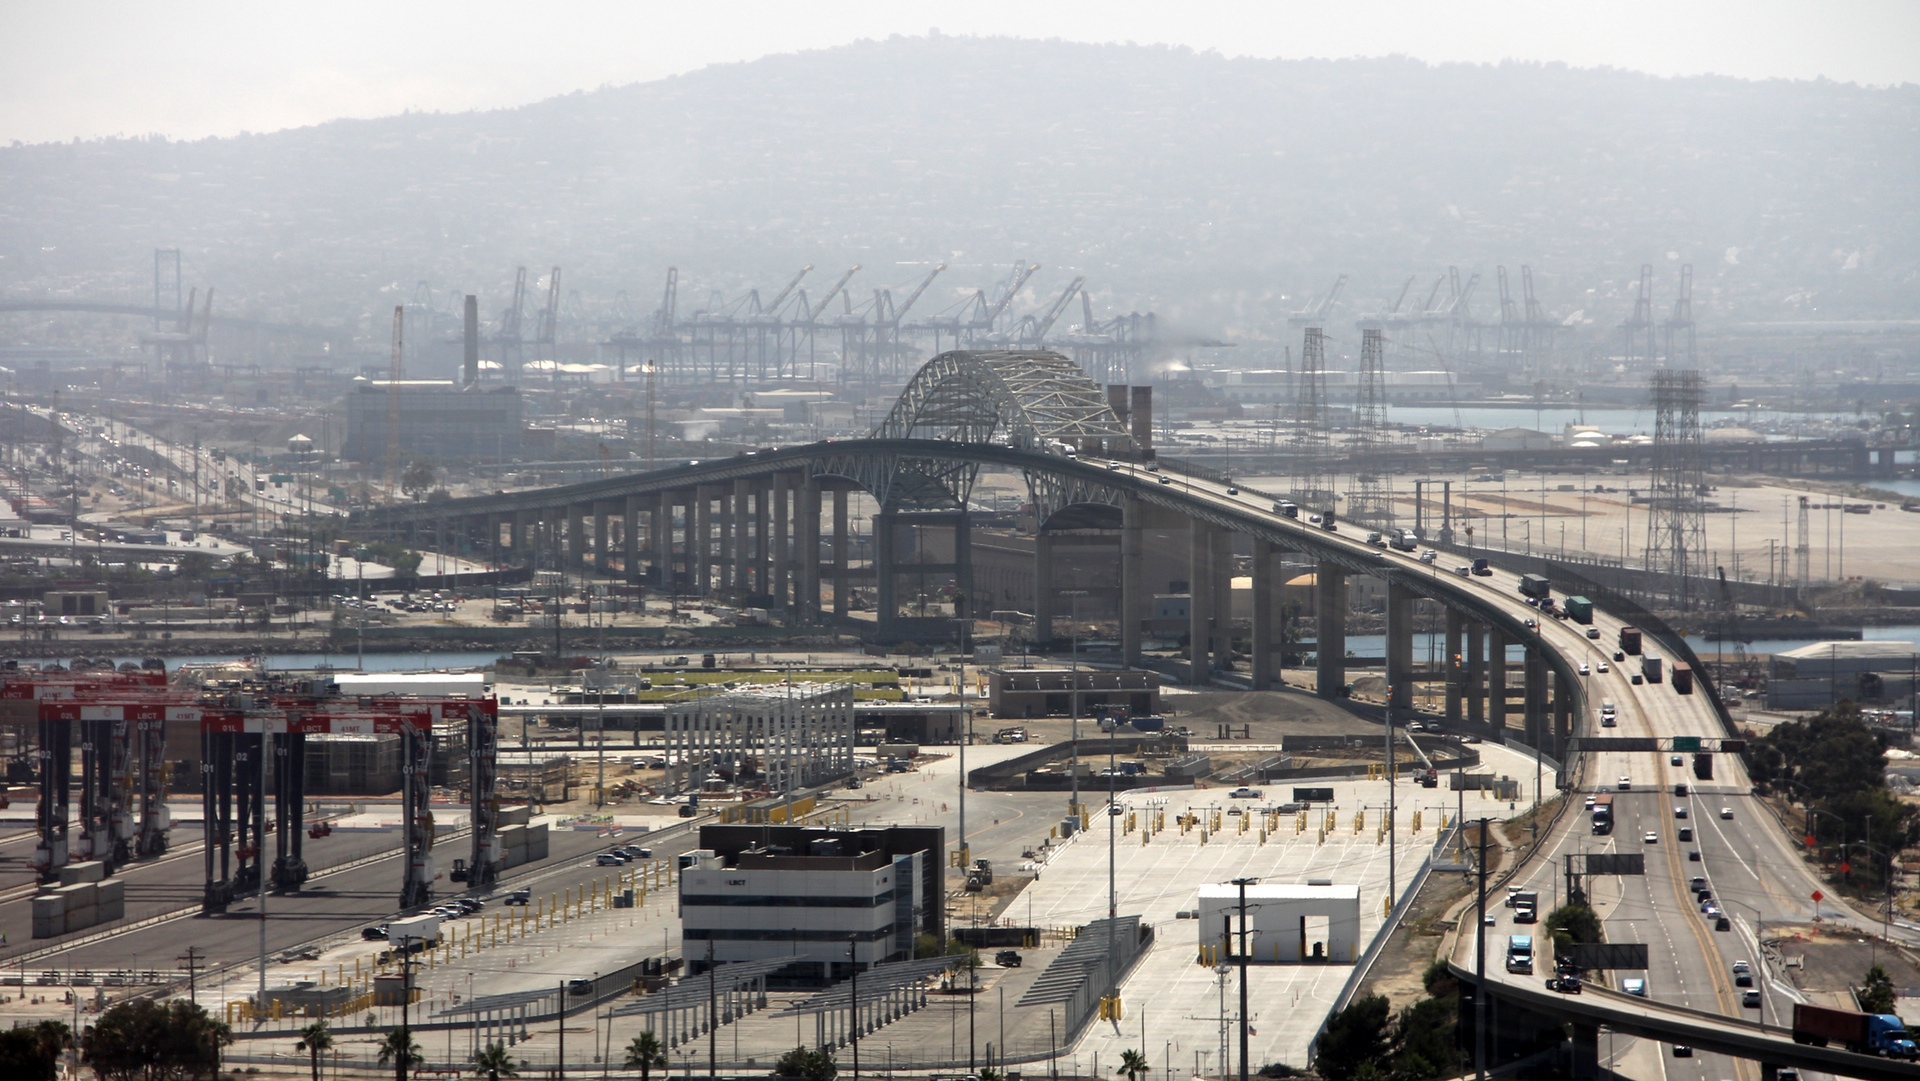 Gerald Desmond Bridge in Long Beach California